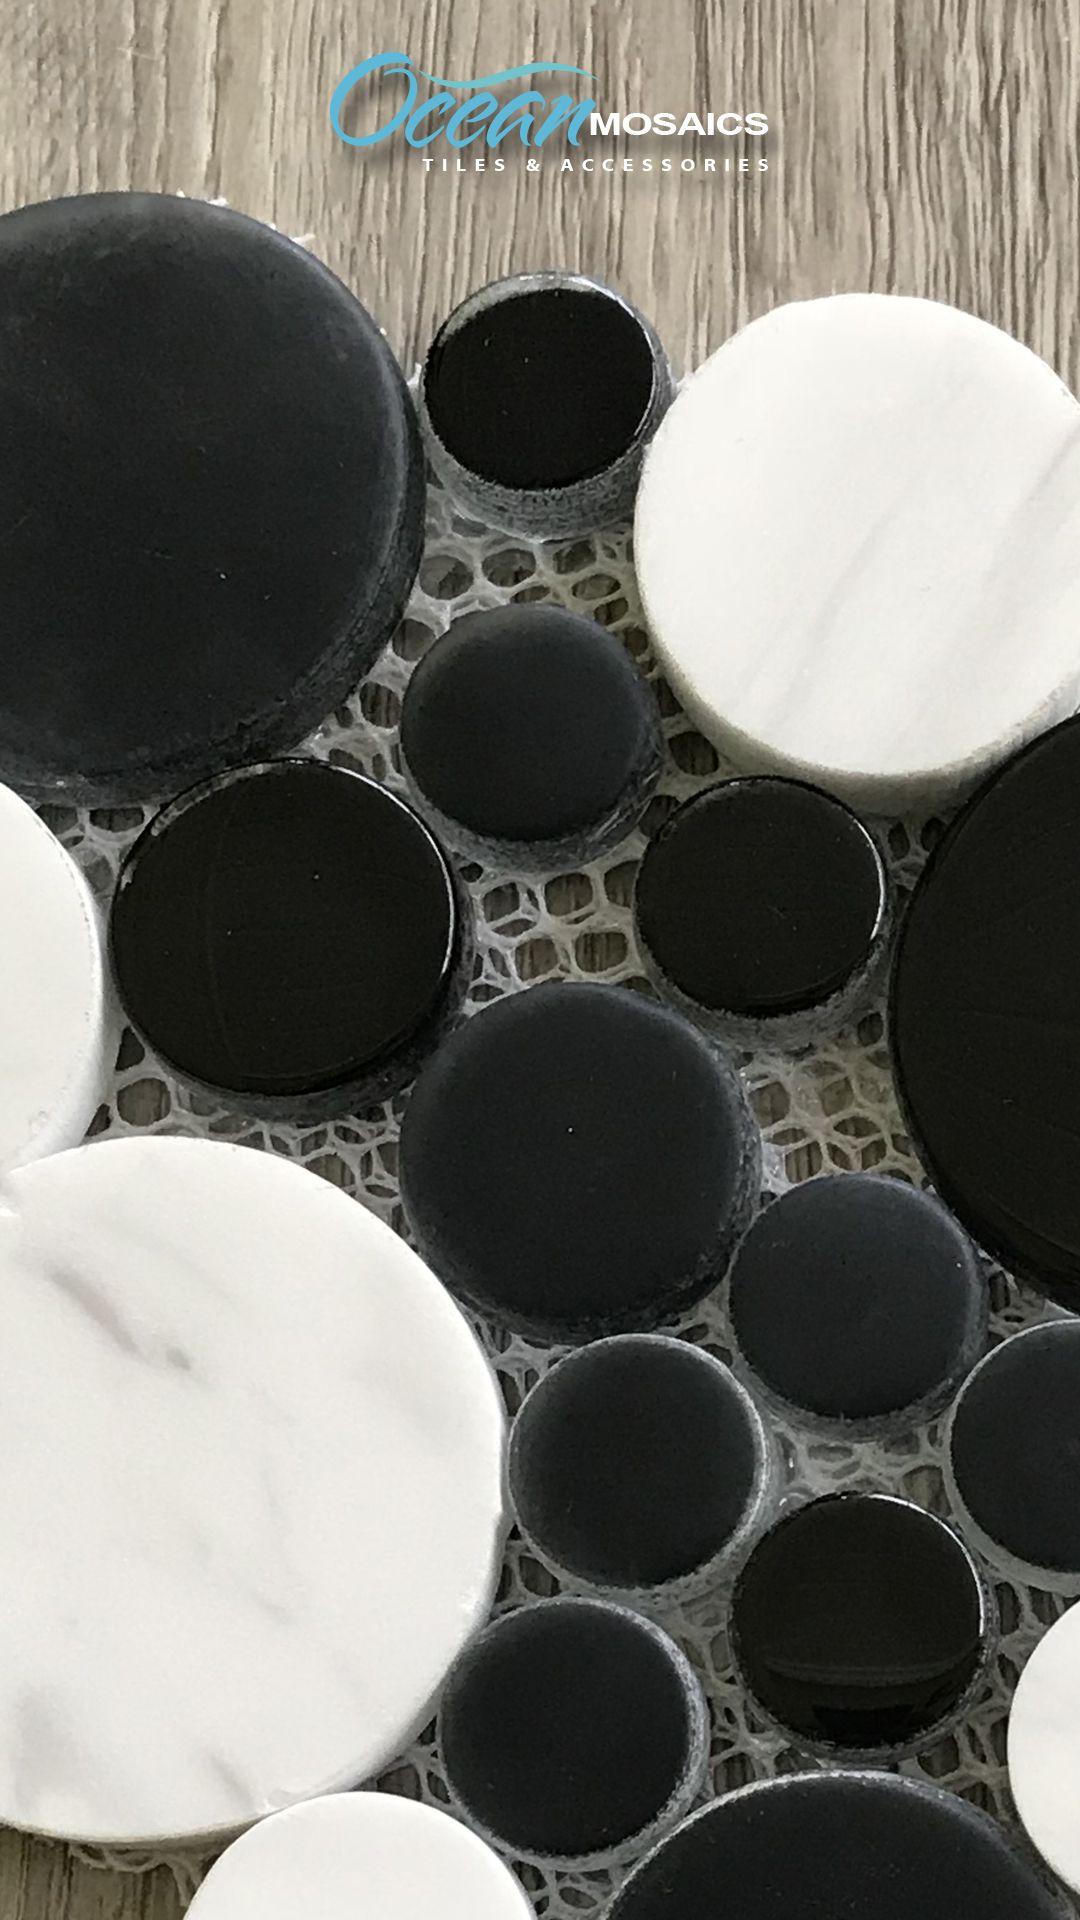 Agata Circle Black And White Mosaic Glass Tile With Images Glass Mosaic Tiles Mosaic Glass Black And White Backsplash